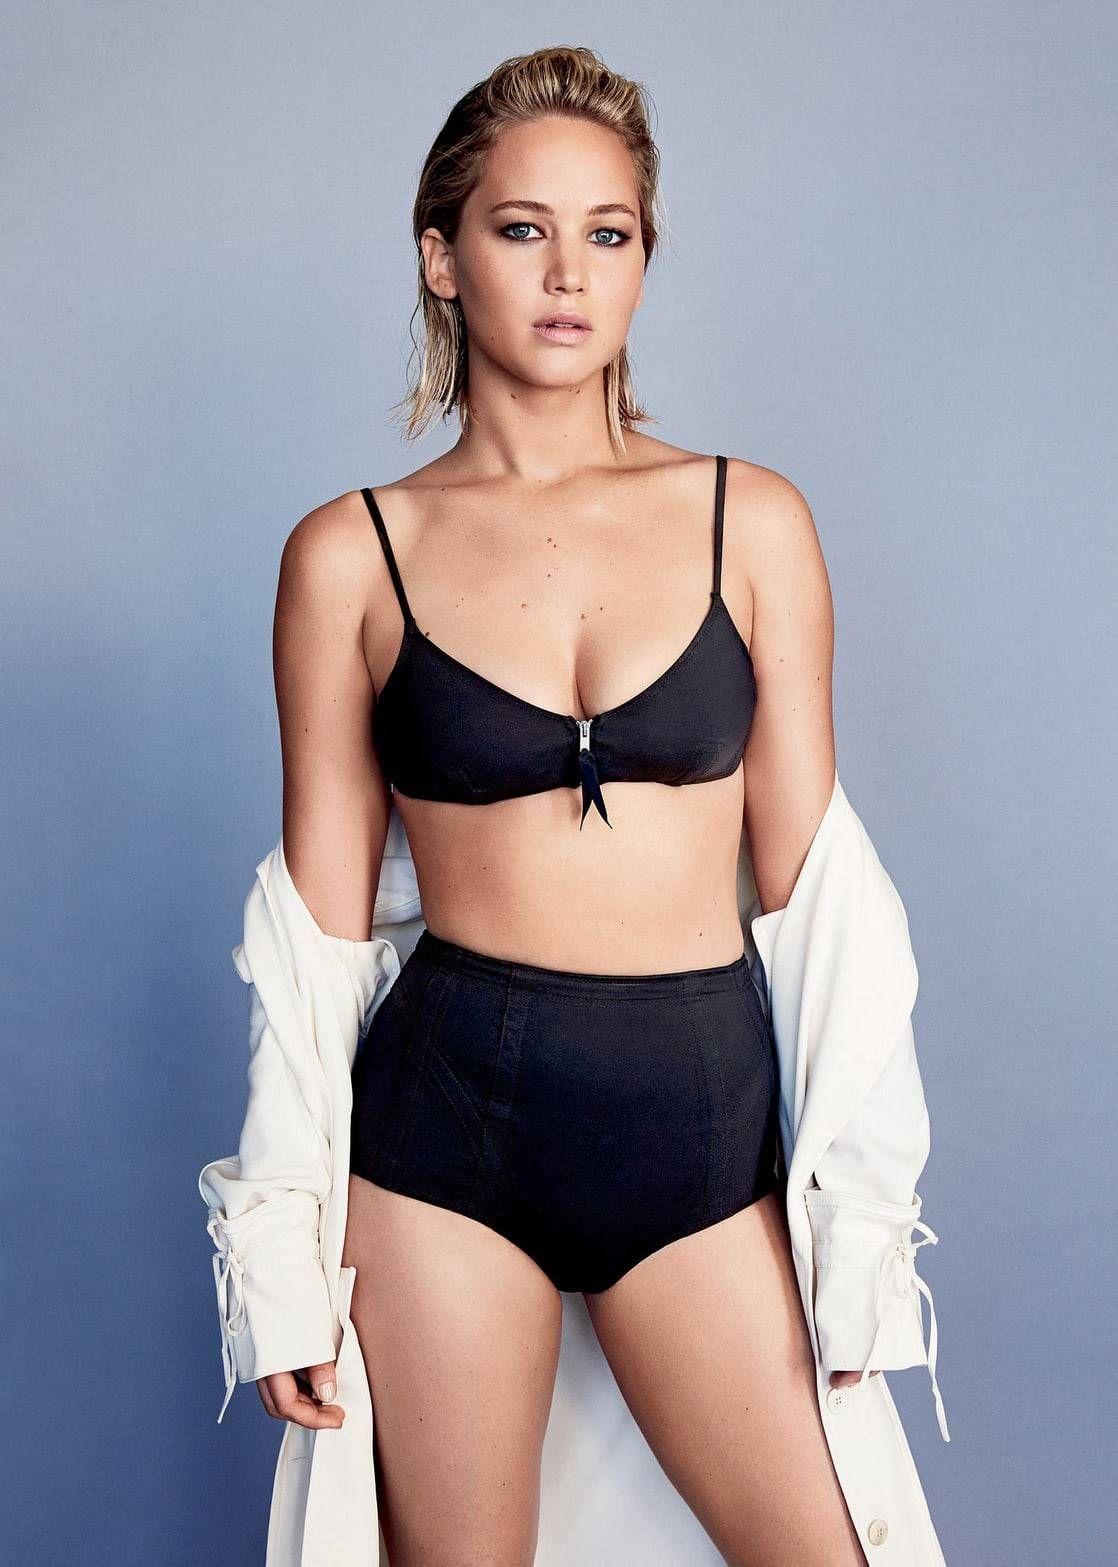 Demi Moore bikini. 2018-2019 celebrityes photos leaks!